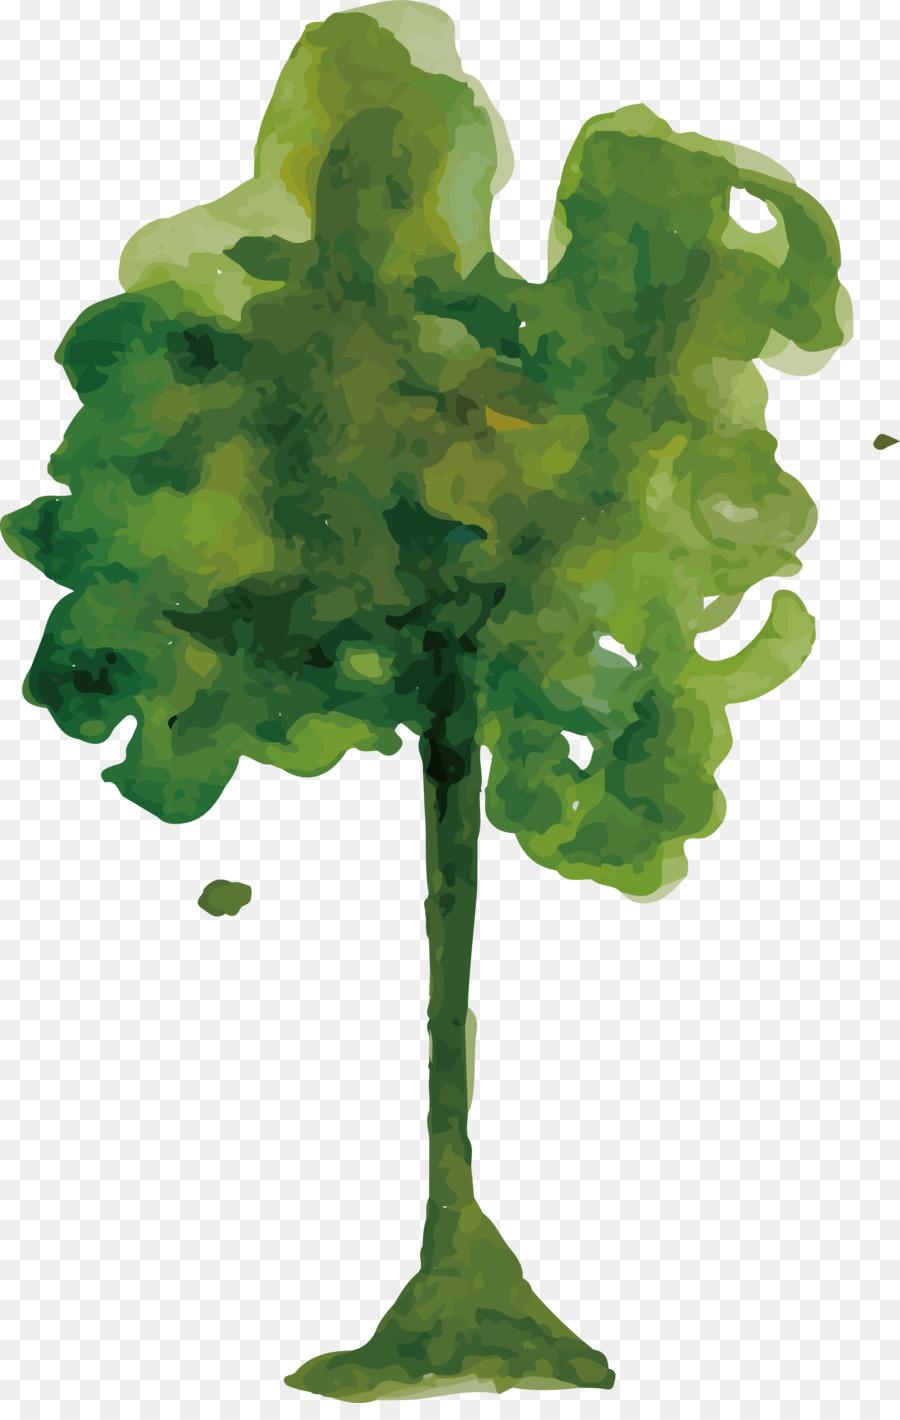 Watercolor painting Tree - Watercolor tree design png download ...